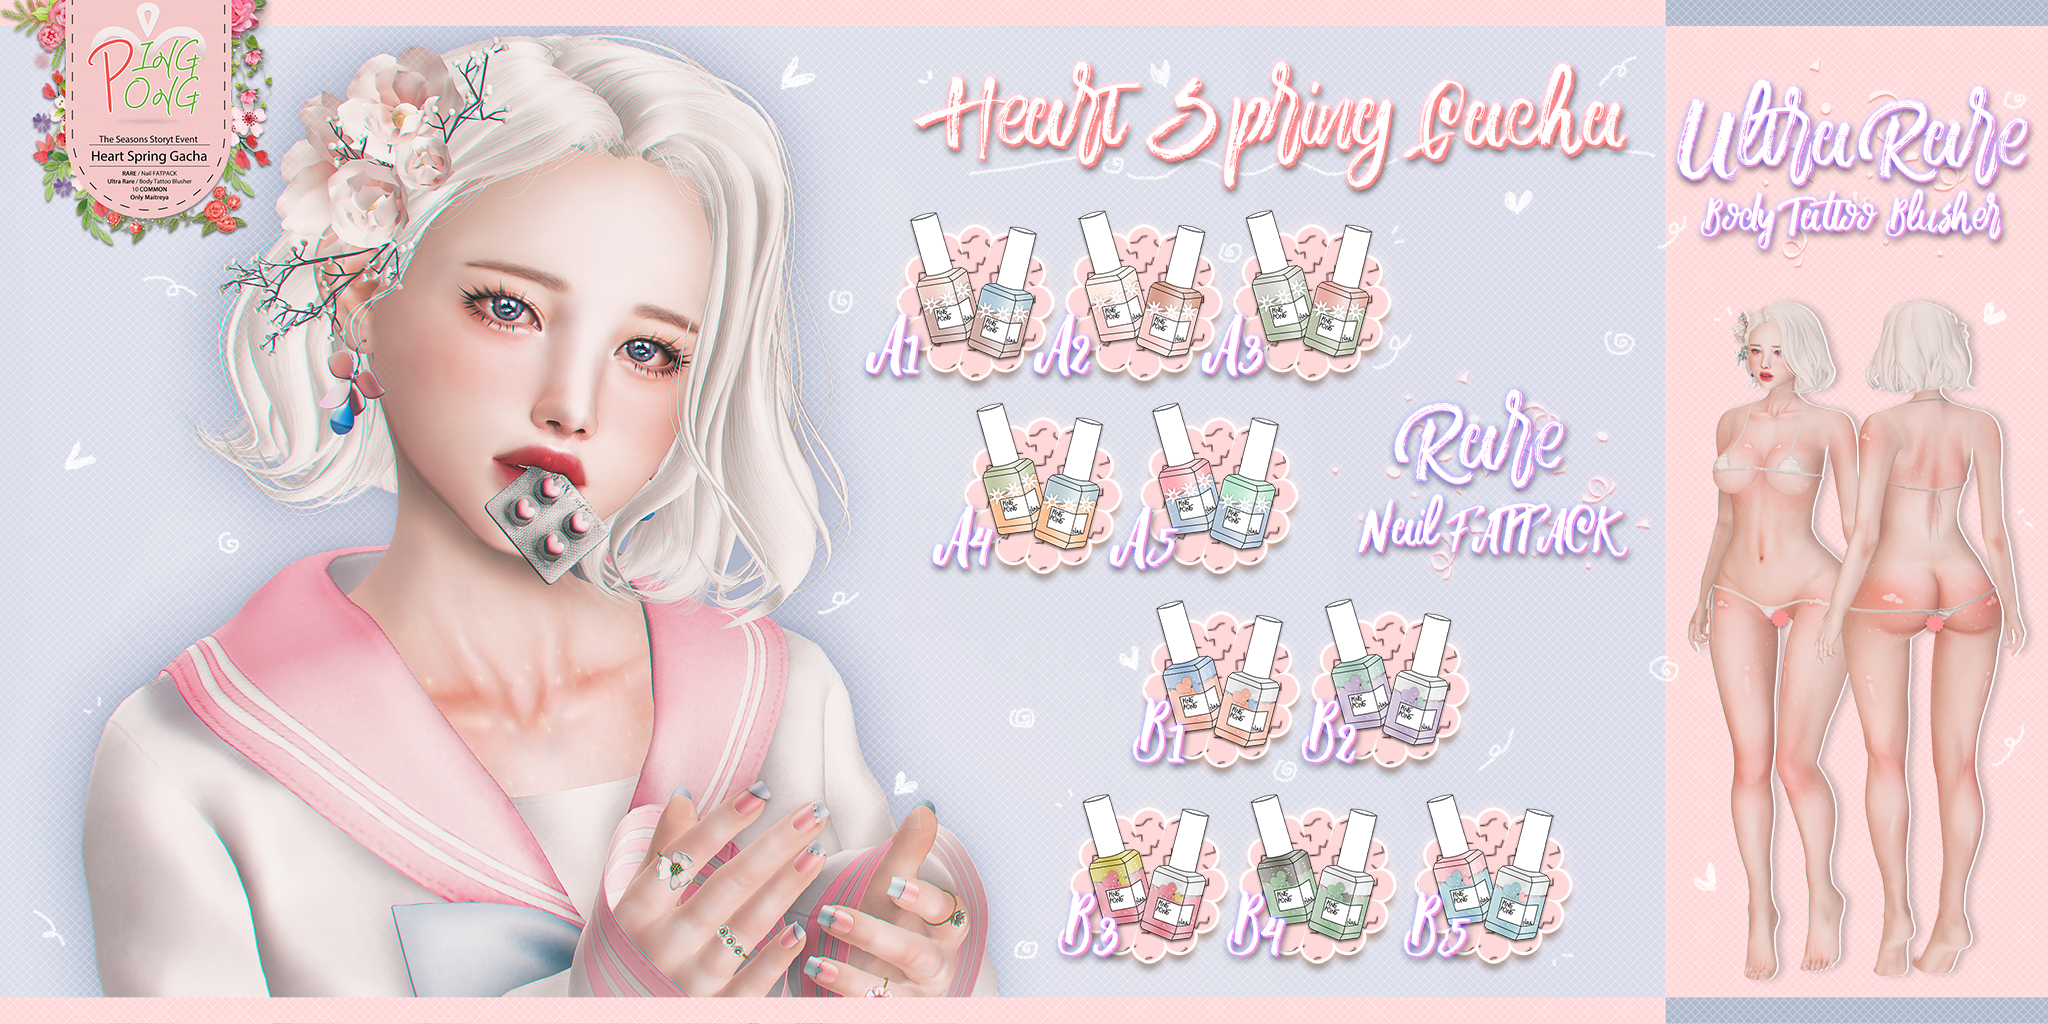 {PINGPONG} Heart Spring Gacha.png